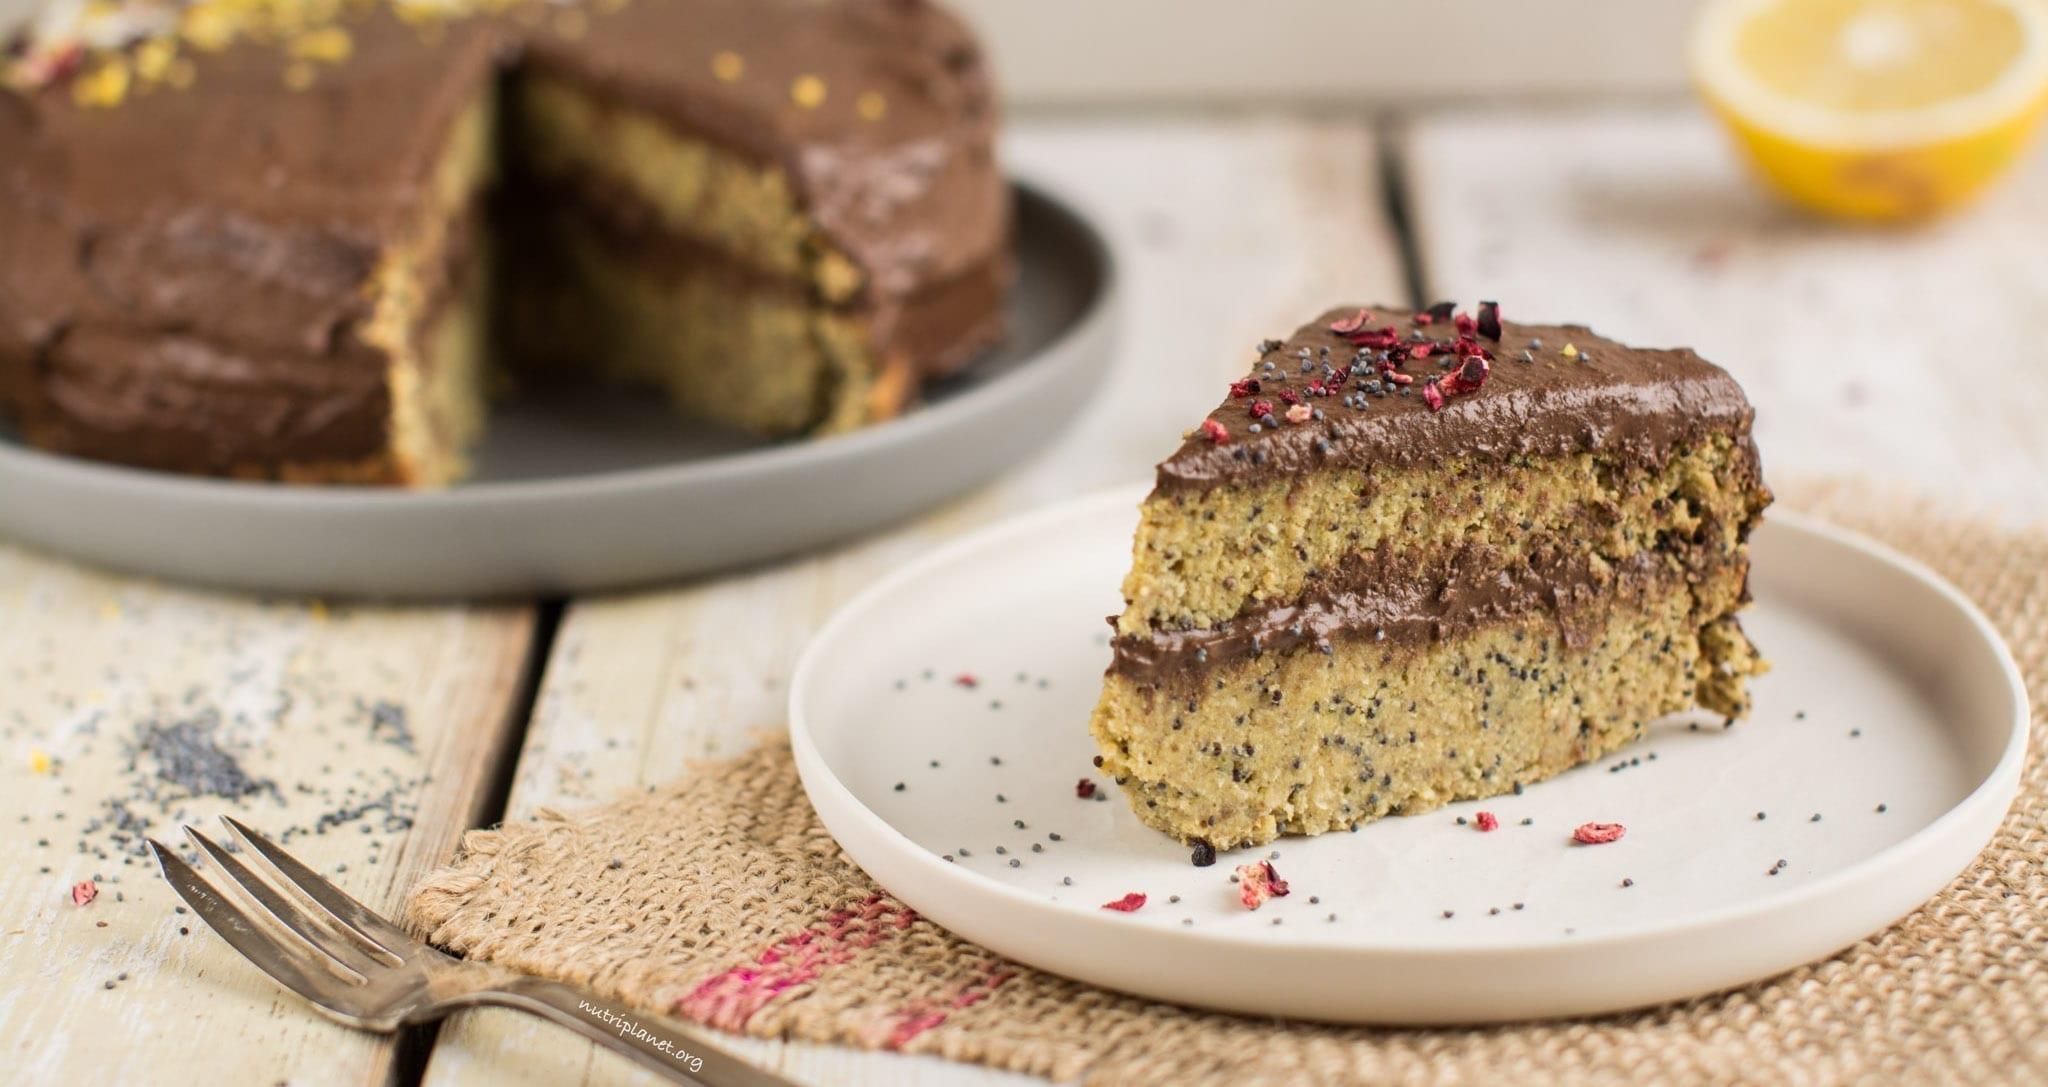 Vegan Lemon Cake with Poppy Seeds